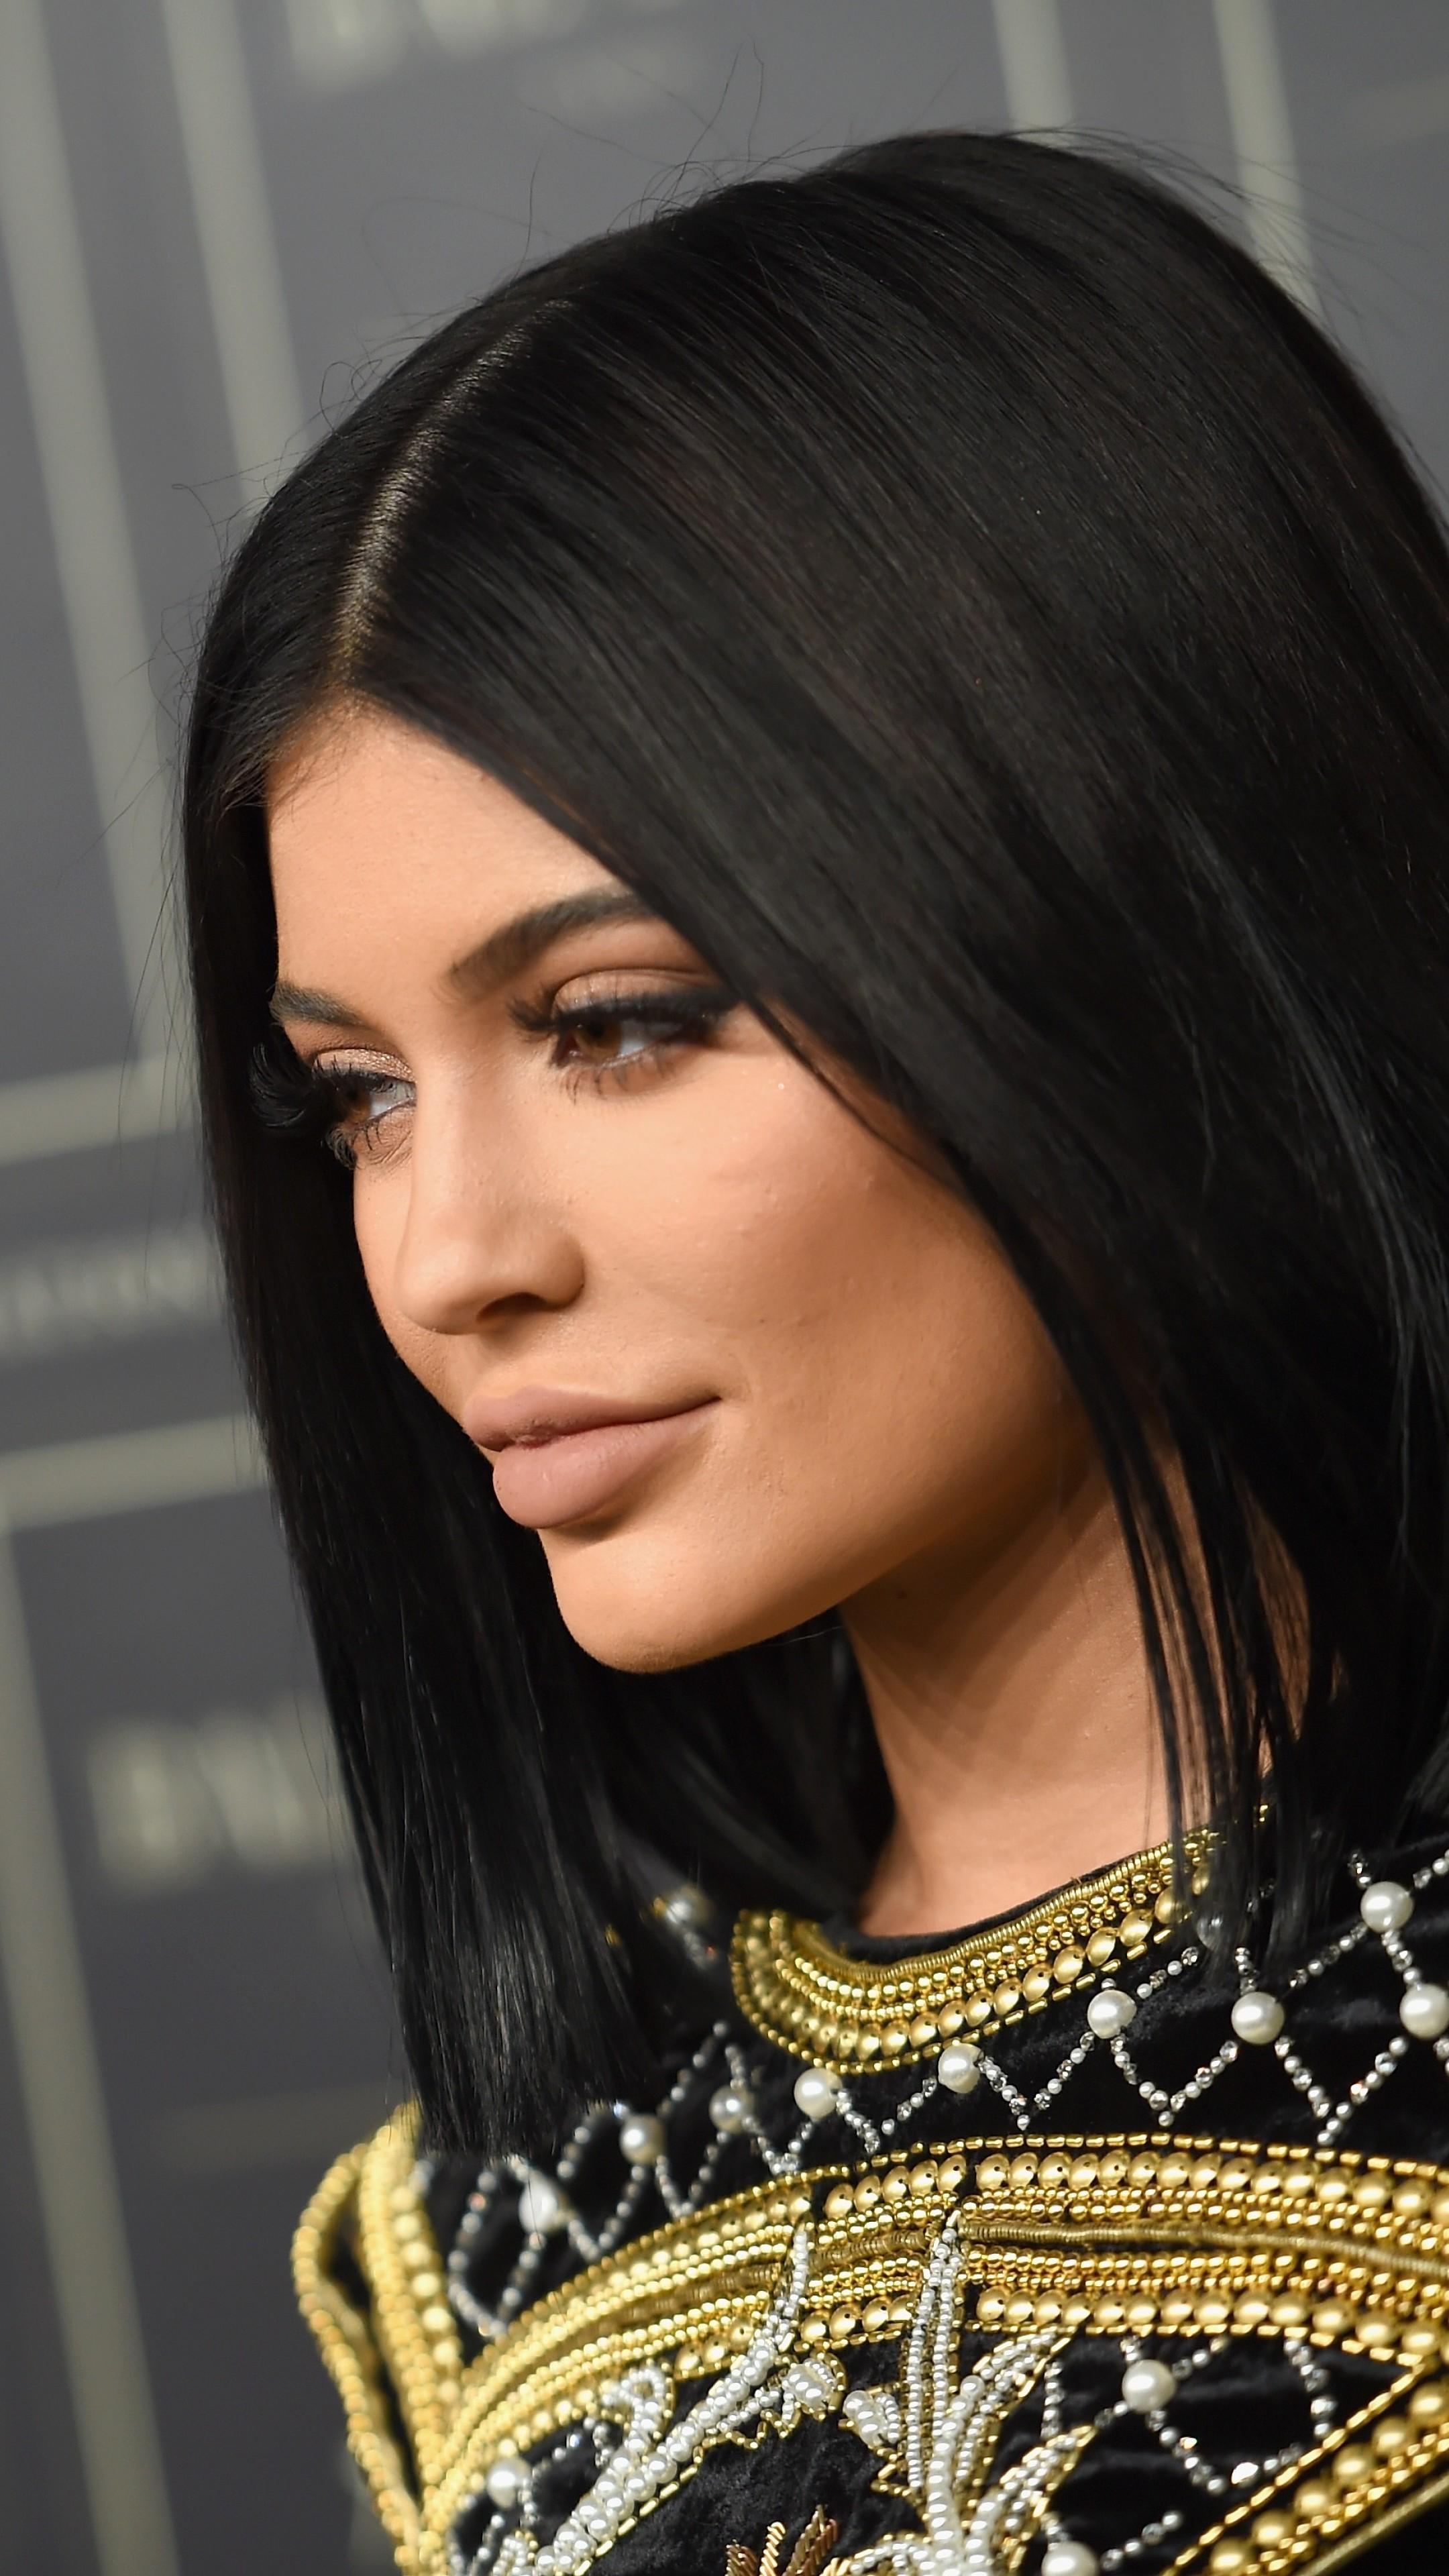 Wallpaper Kylie Jenner Beauty Photo 4k Celebrities 14523